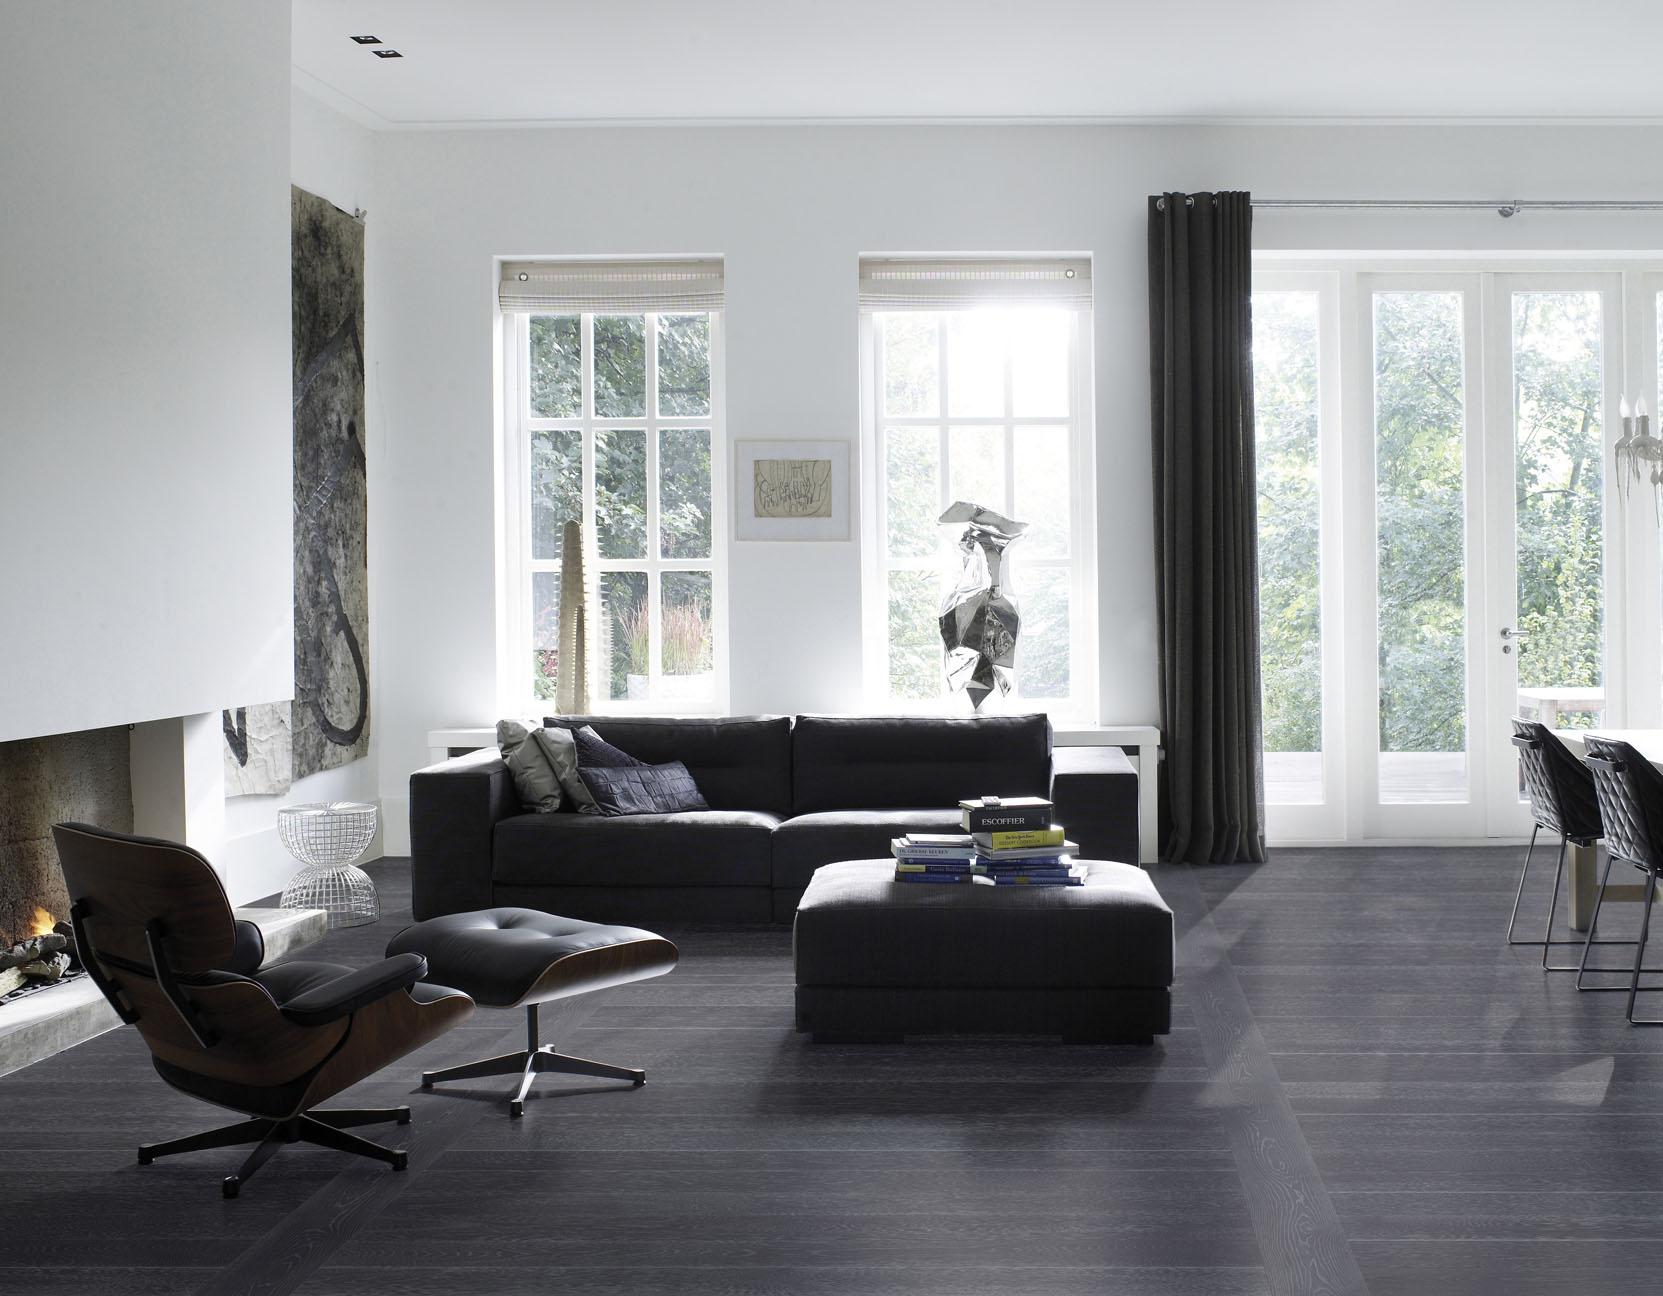 Oedkoop Woonkamer Pimpen: Inrichting woonkamer piet boon vloeren ...